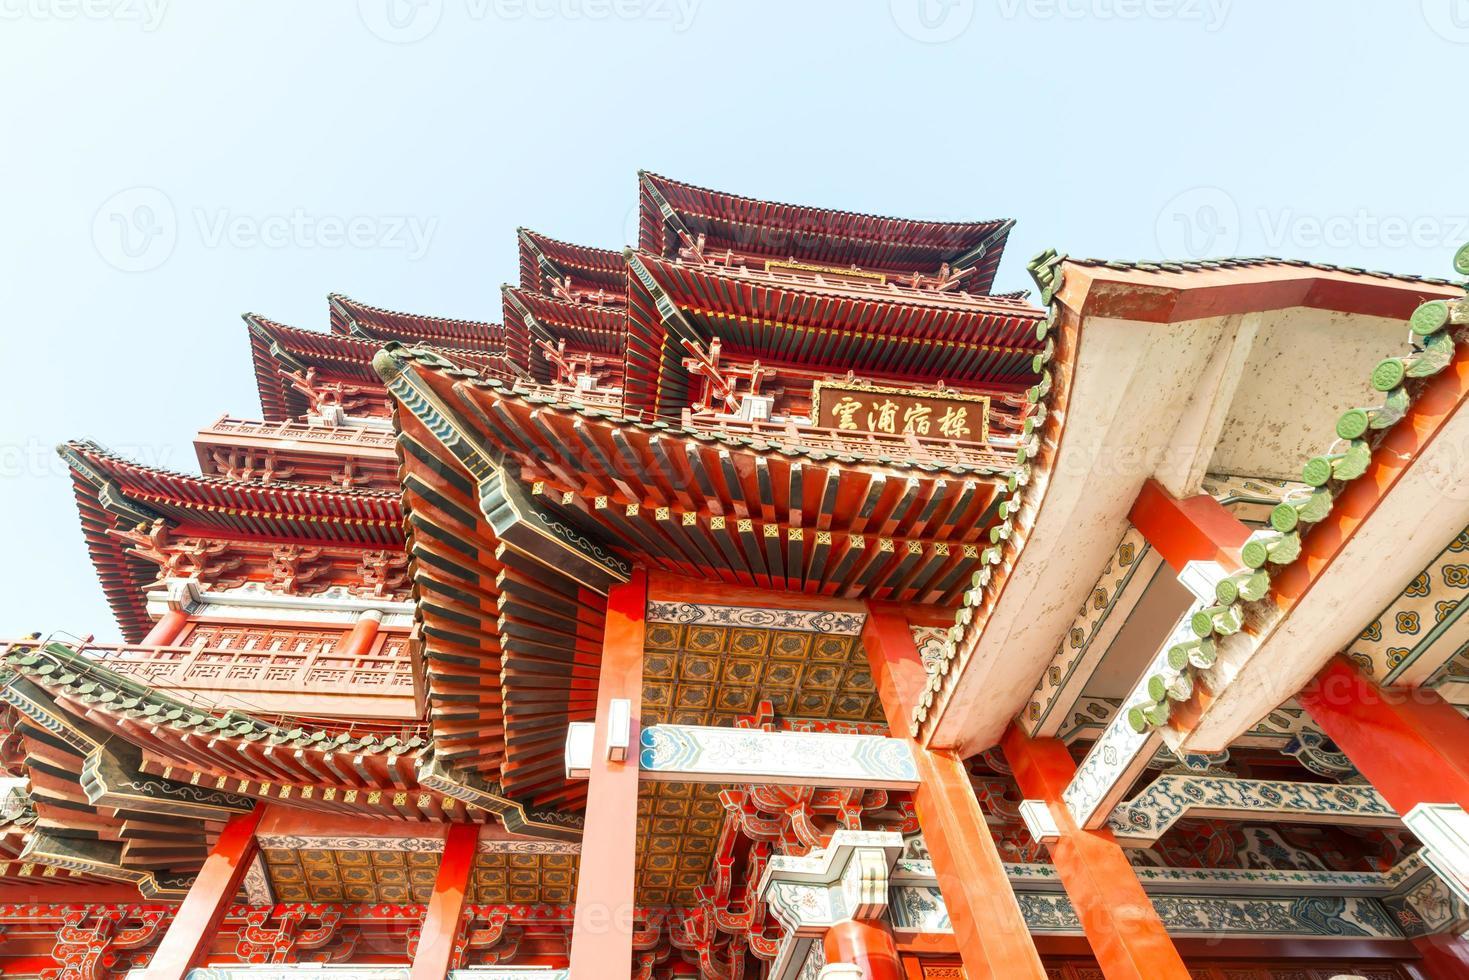 tengwang pavilion, nanchang, t raditional, oud chinees archite foto